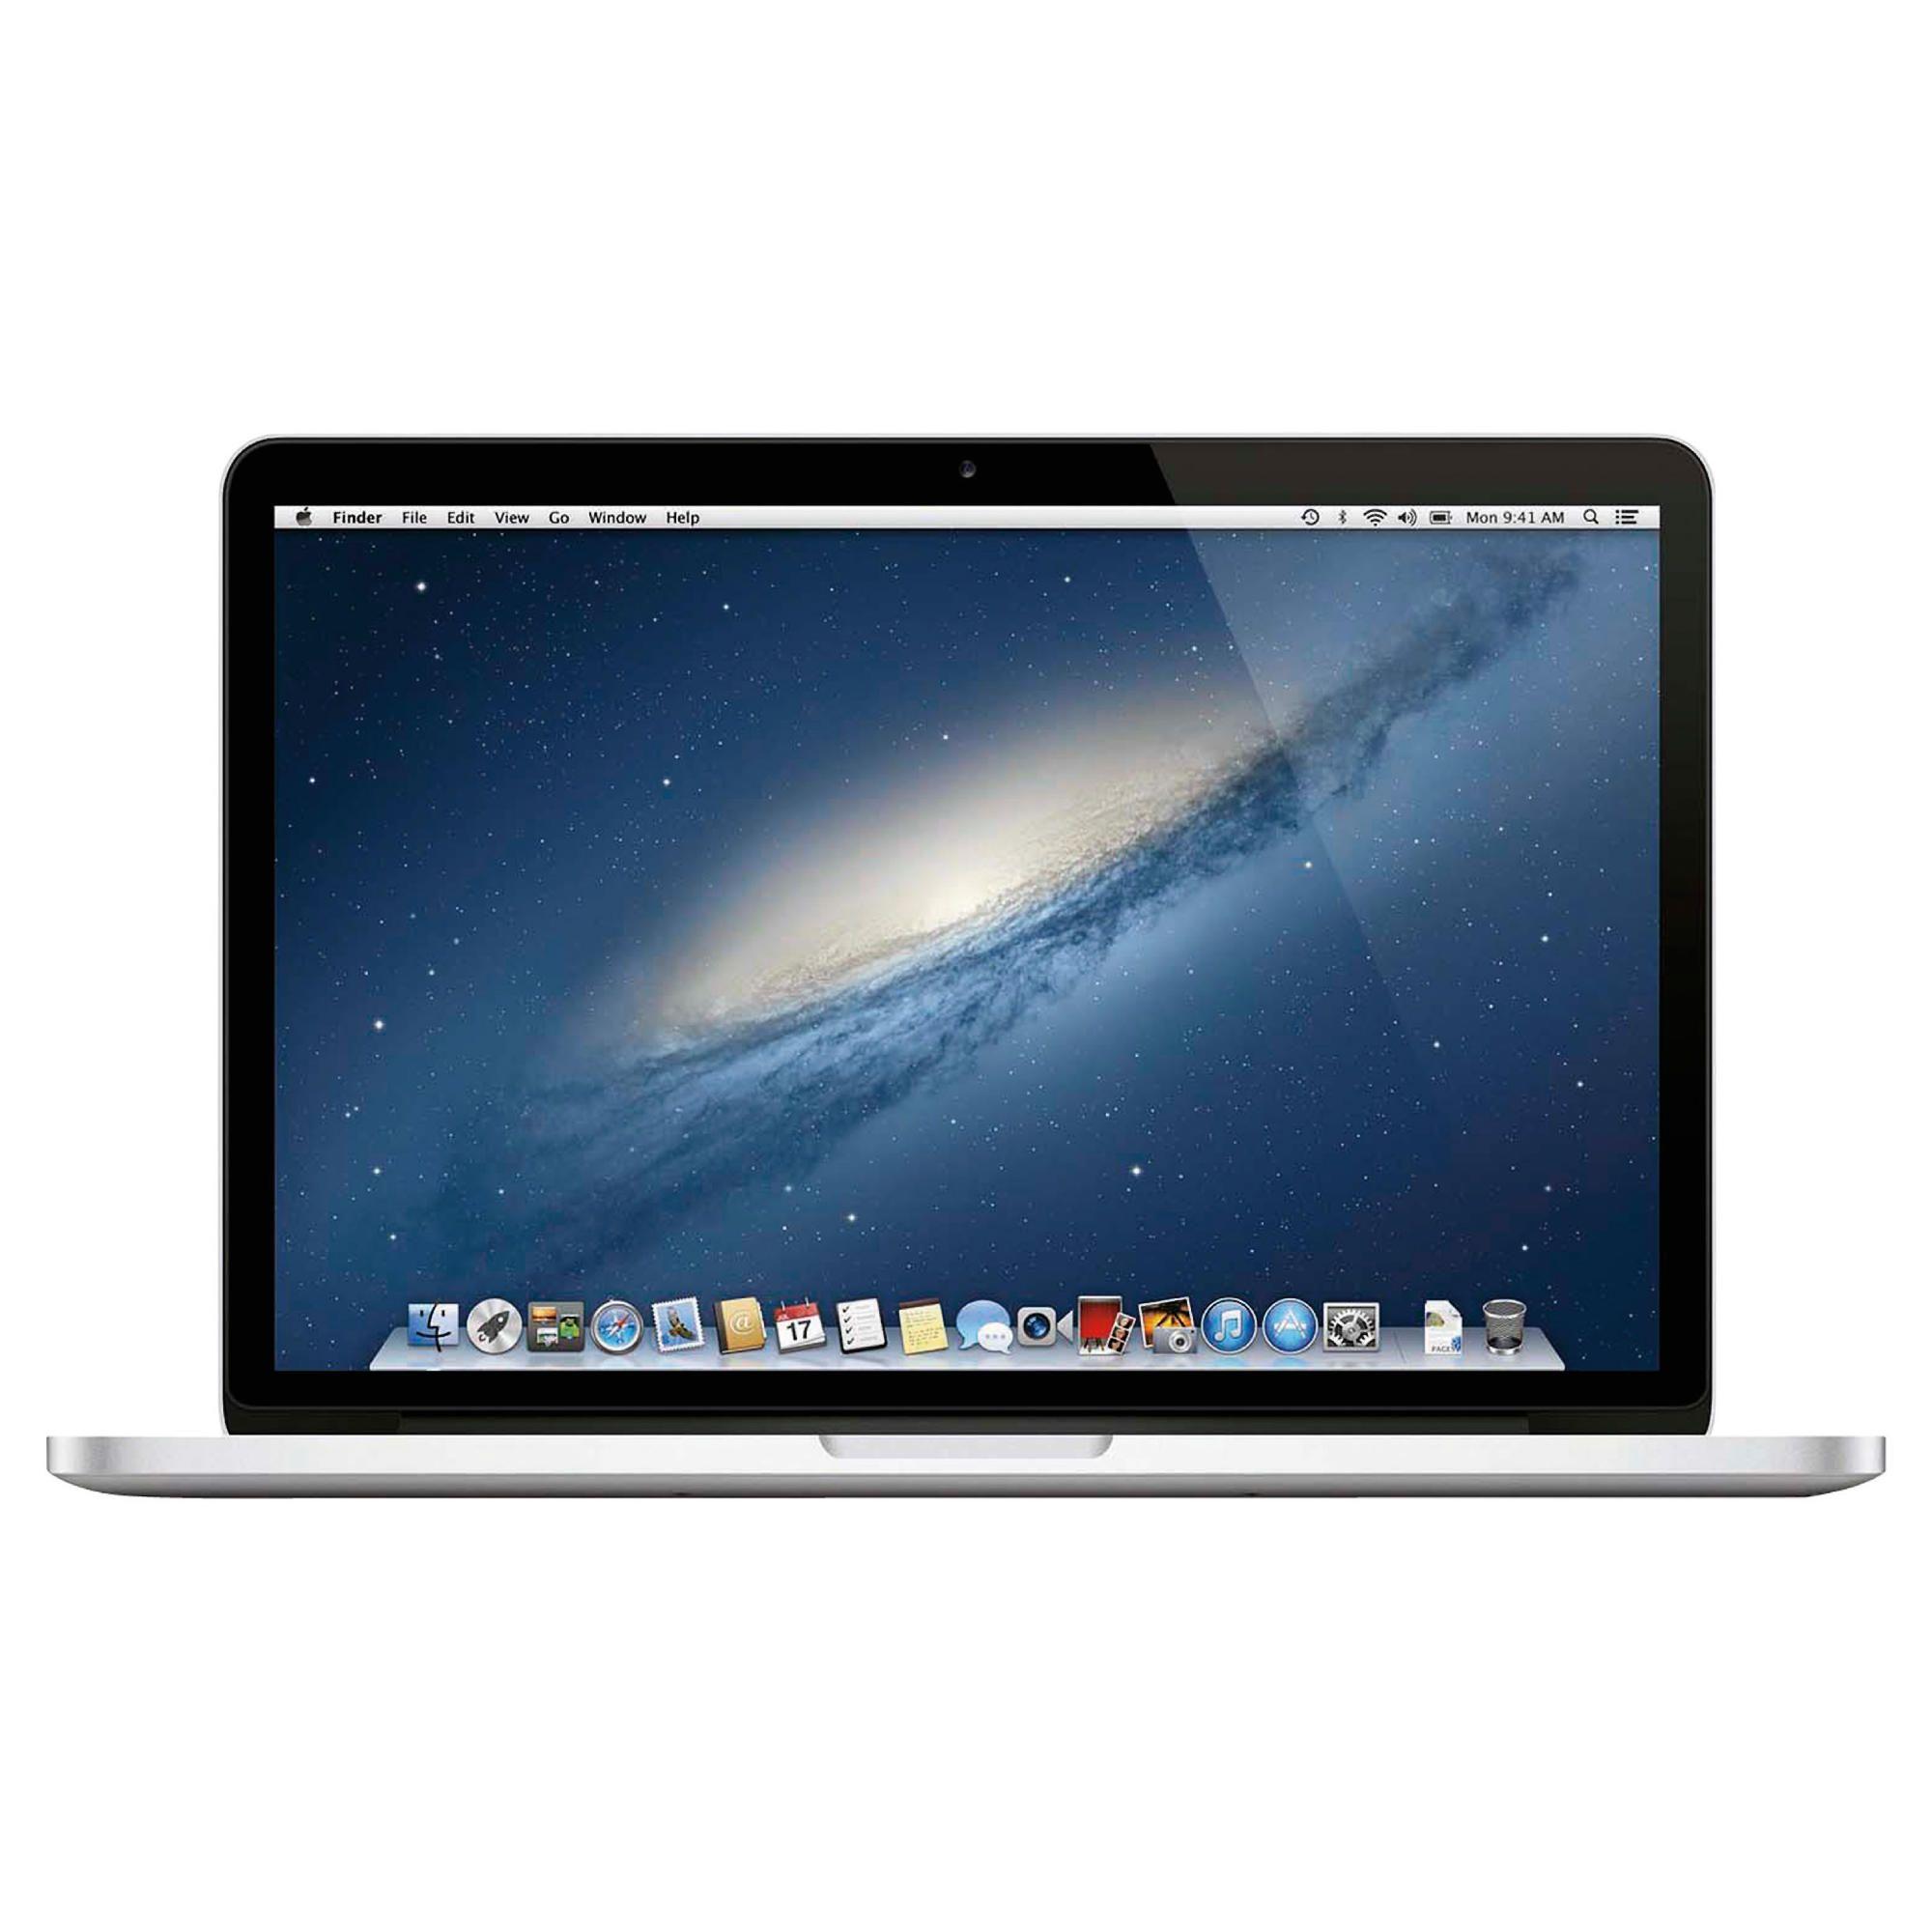 "MacBook Pro 13.3"" with Retina display ME864B/A 2.4GHZ 4GB 128GB Flash Drive"